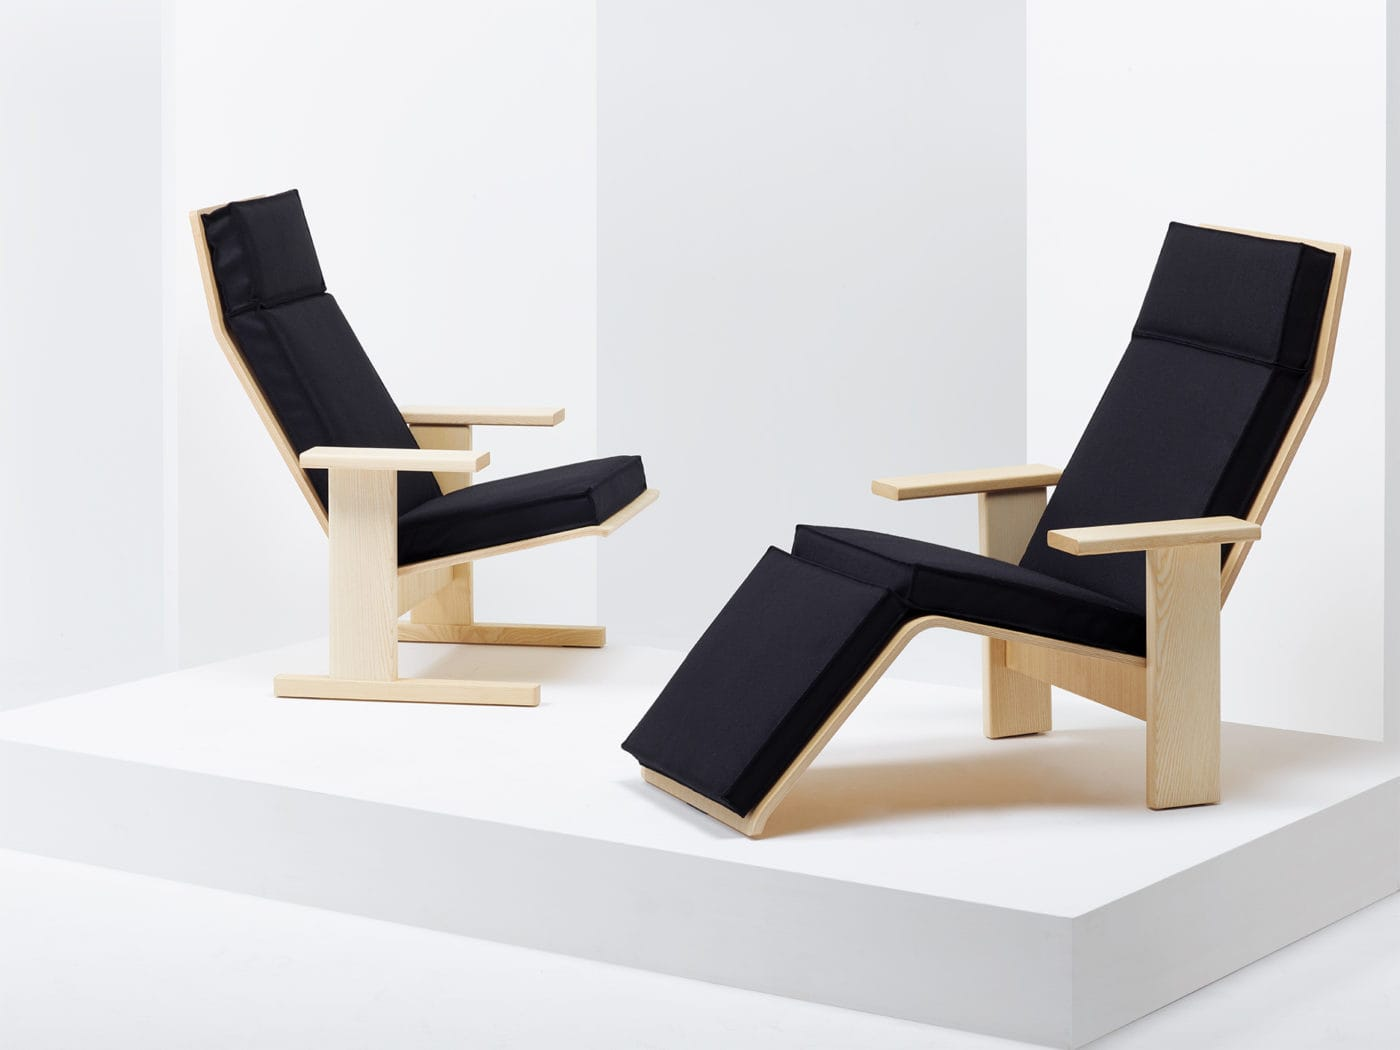 mc15 quindici lounge by ronan erwan bouroullec for mattiazzi. Black Bedroom Furniture Sets. Home Design Ideas